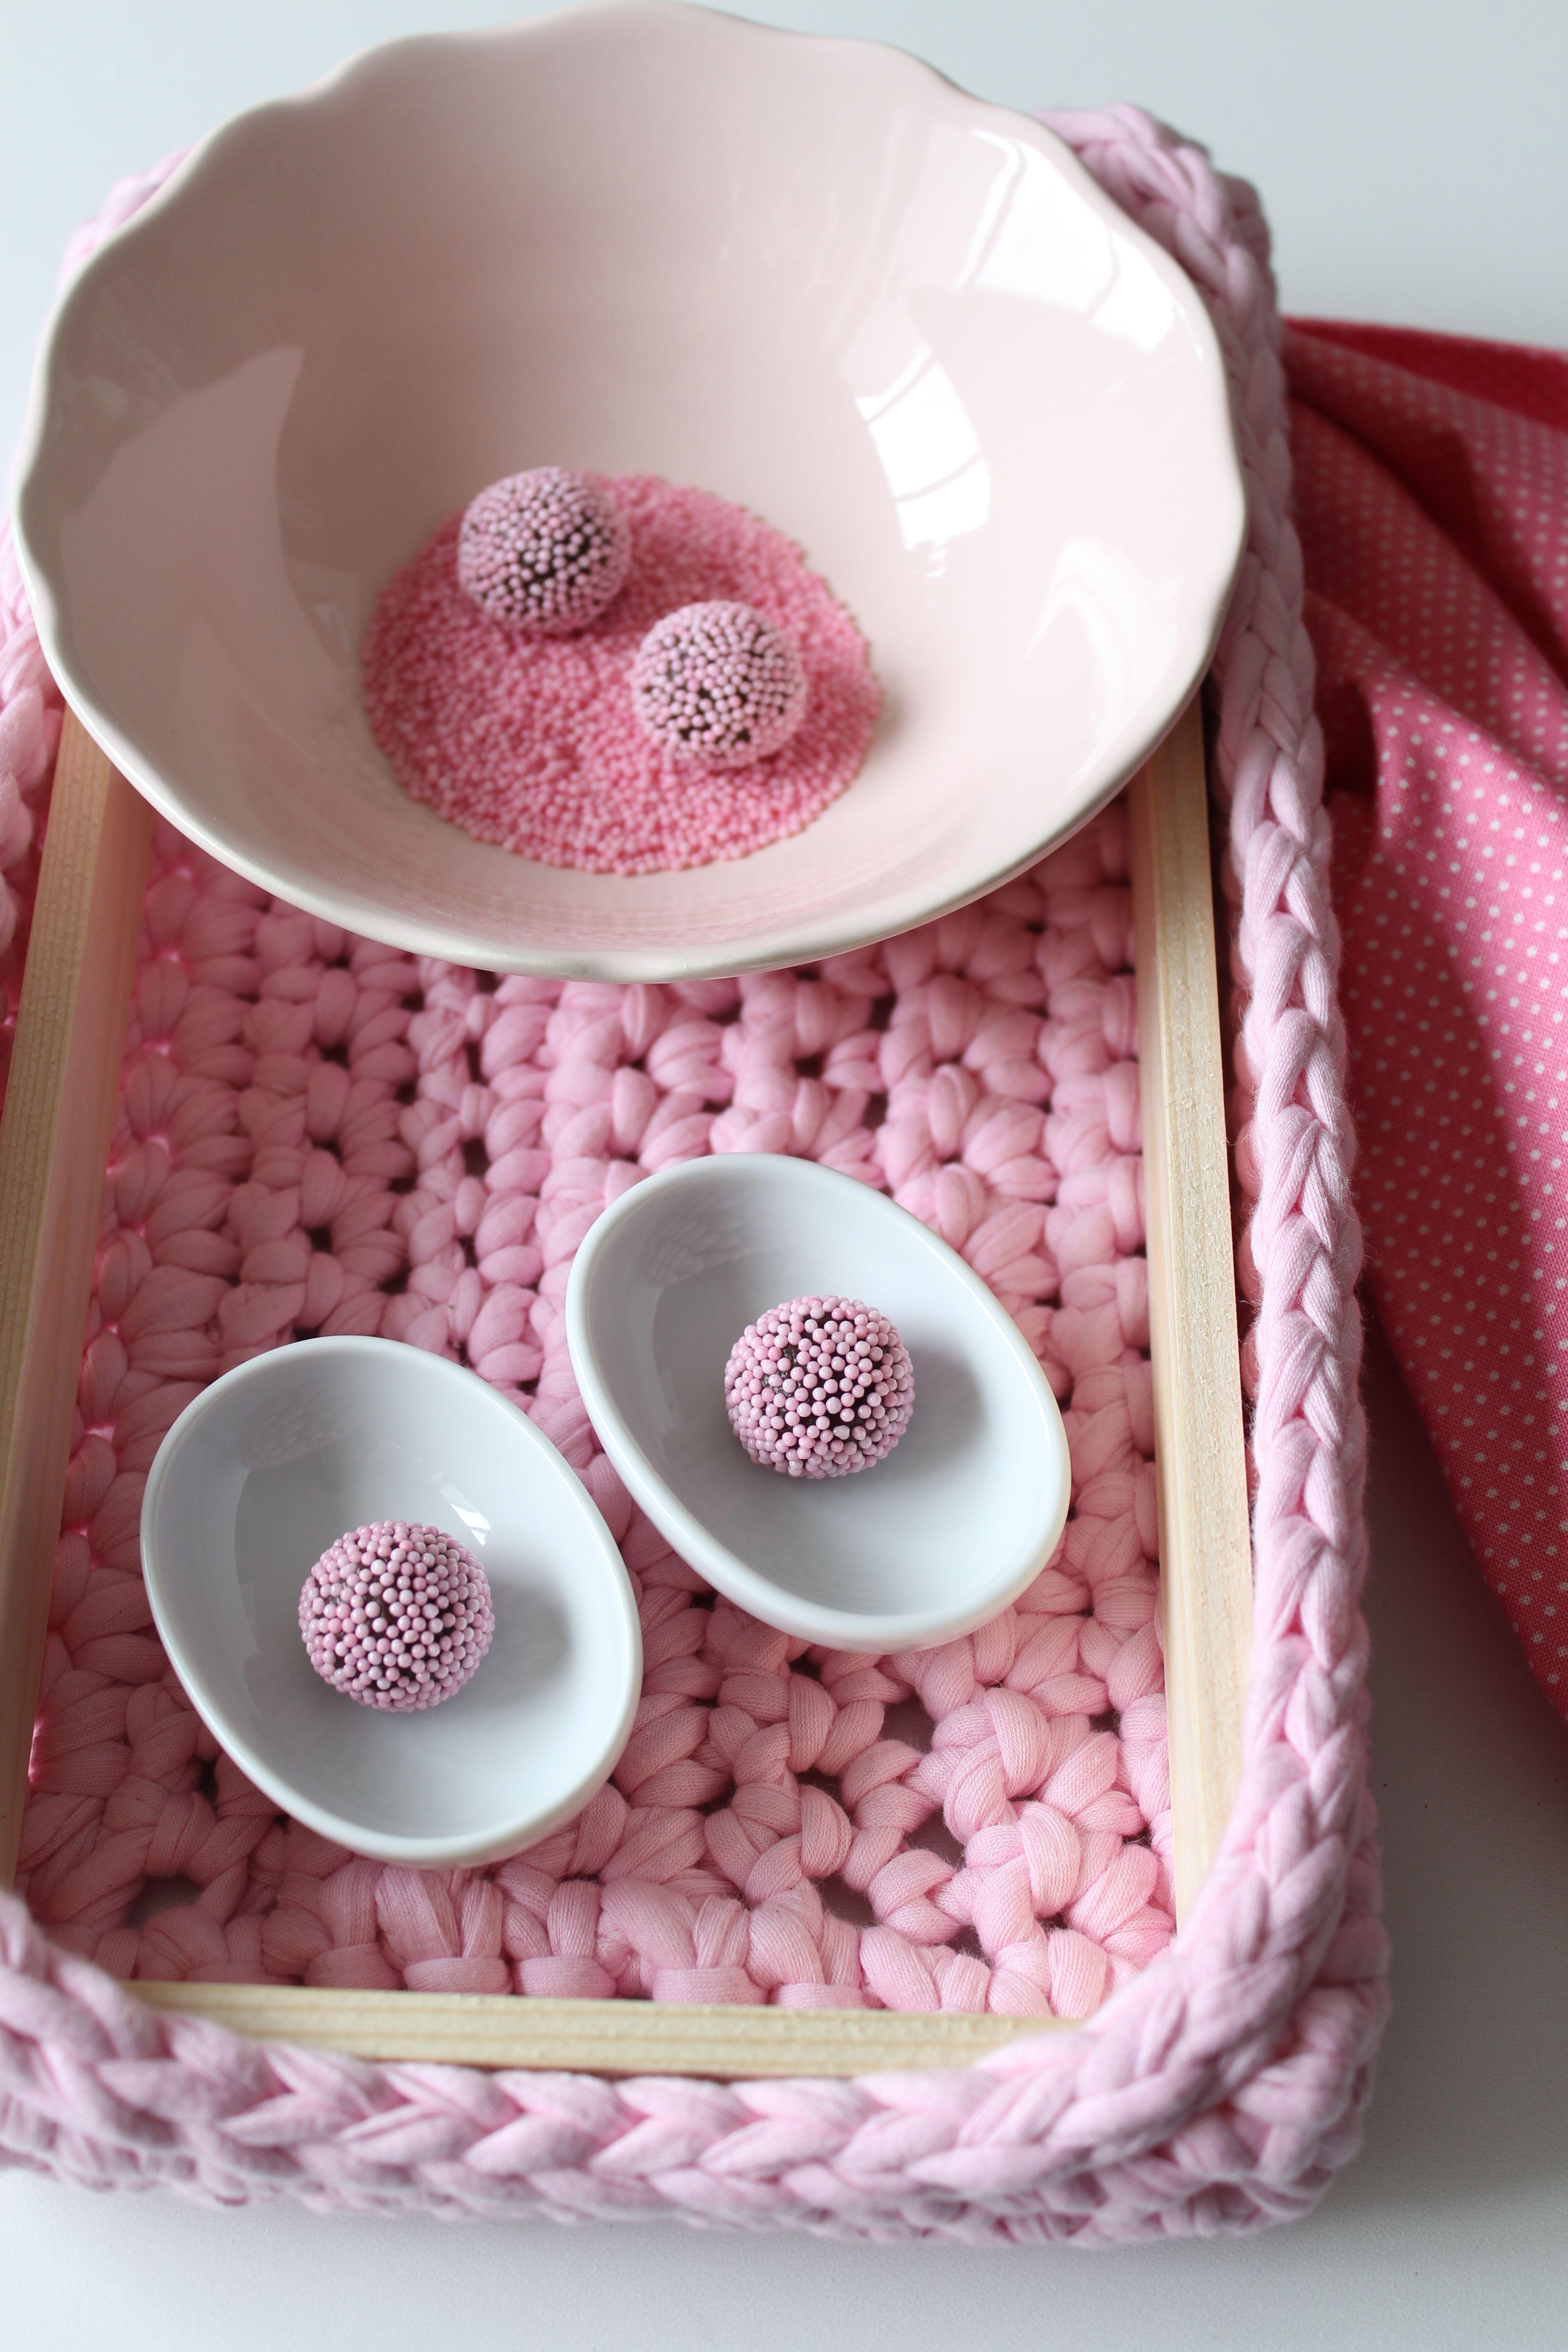 Pink brigadeiros (truffles)